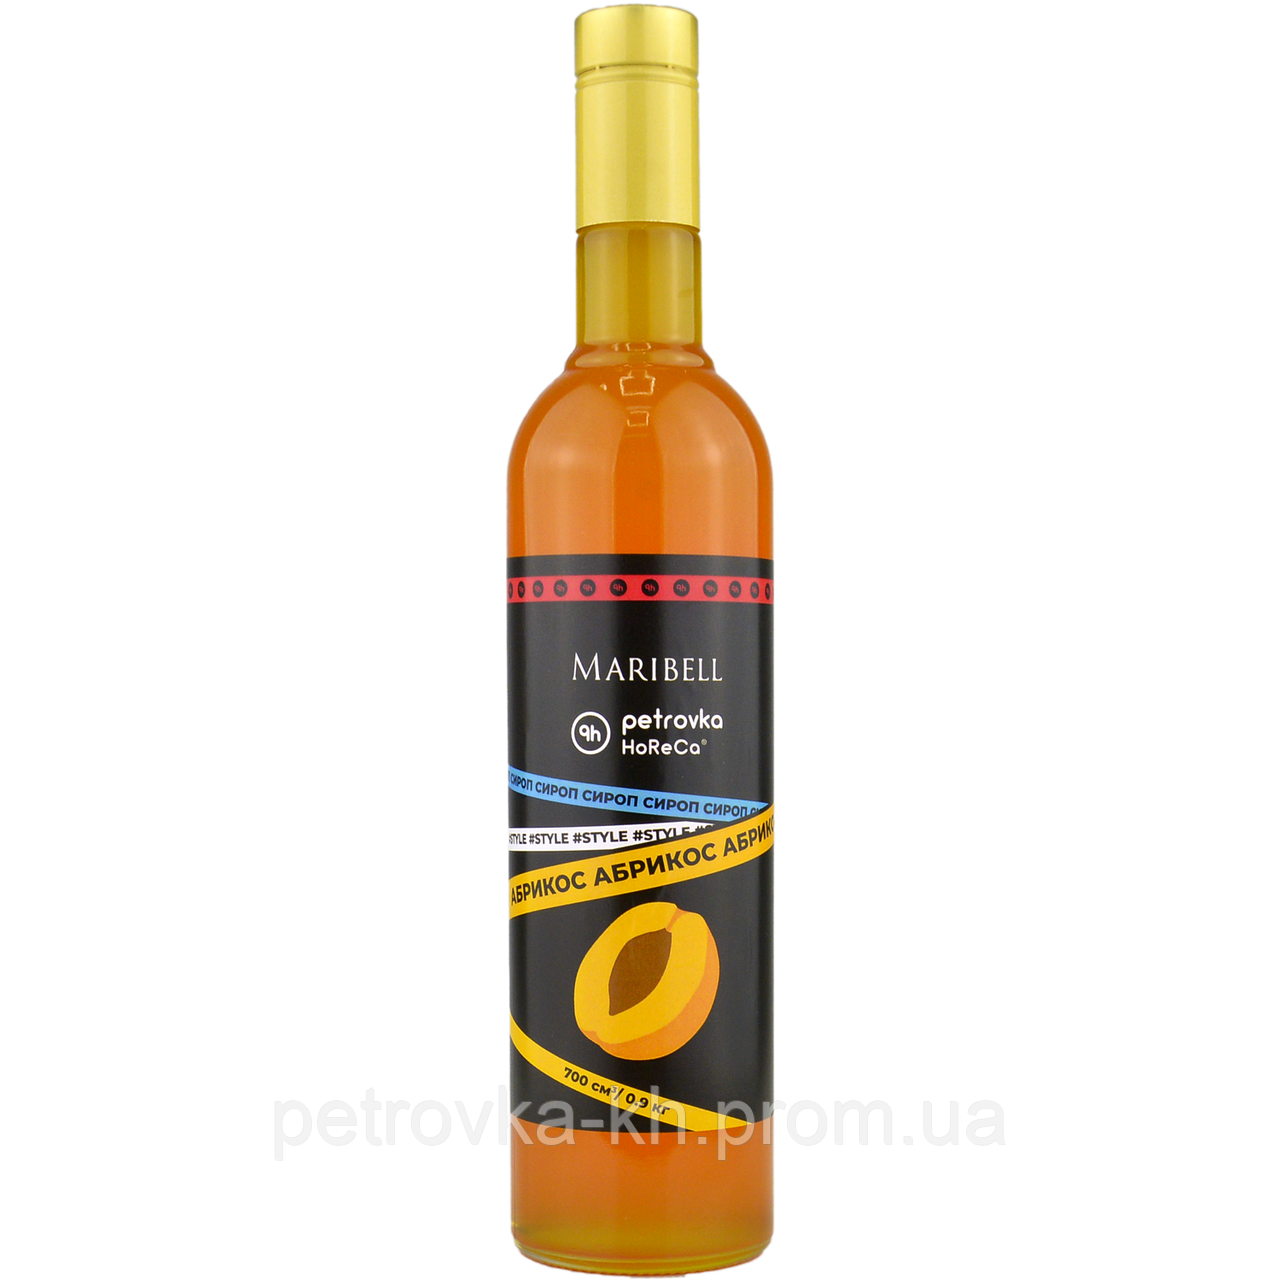 Сироп 'Абрикос' для коктейлів Maribell-Petrovka Horeca 700мл